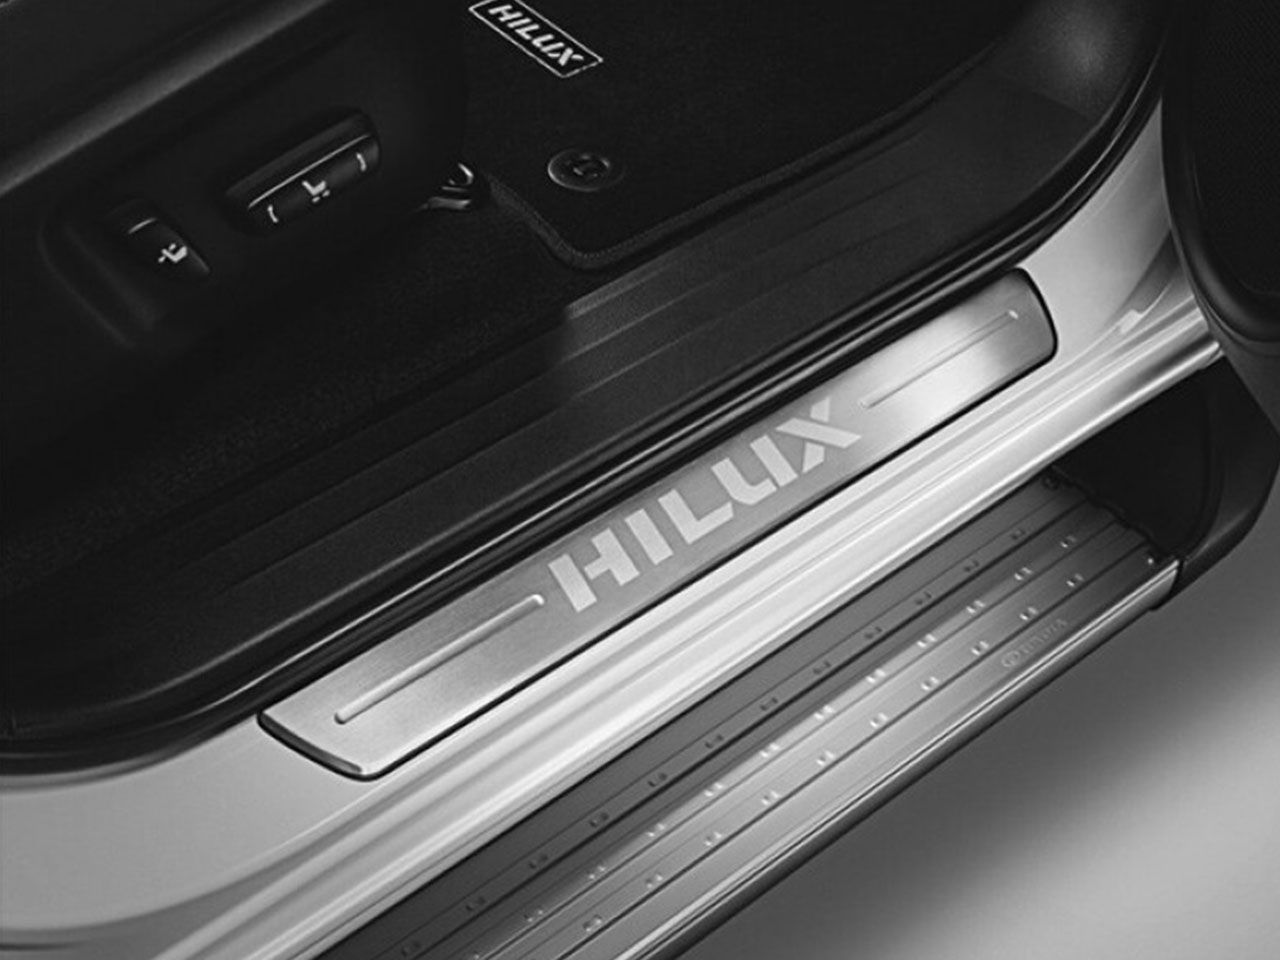 Soleira Hilux STD SR SRV SRX   - Mirai Peças Toyota